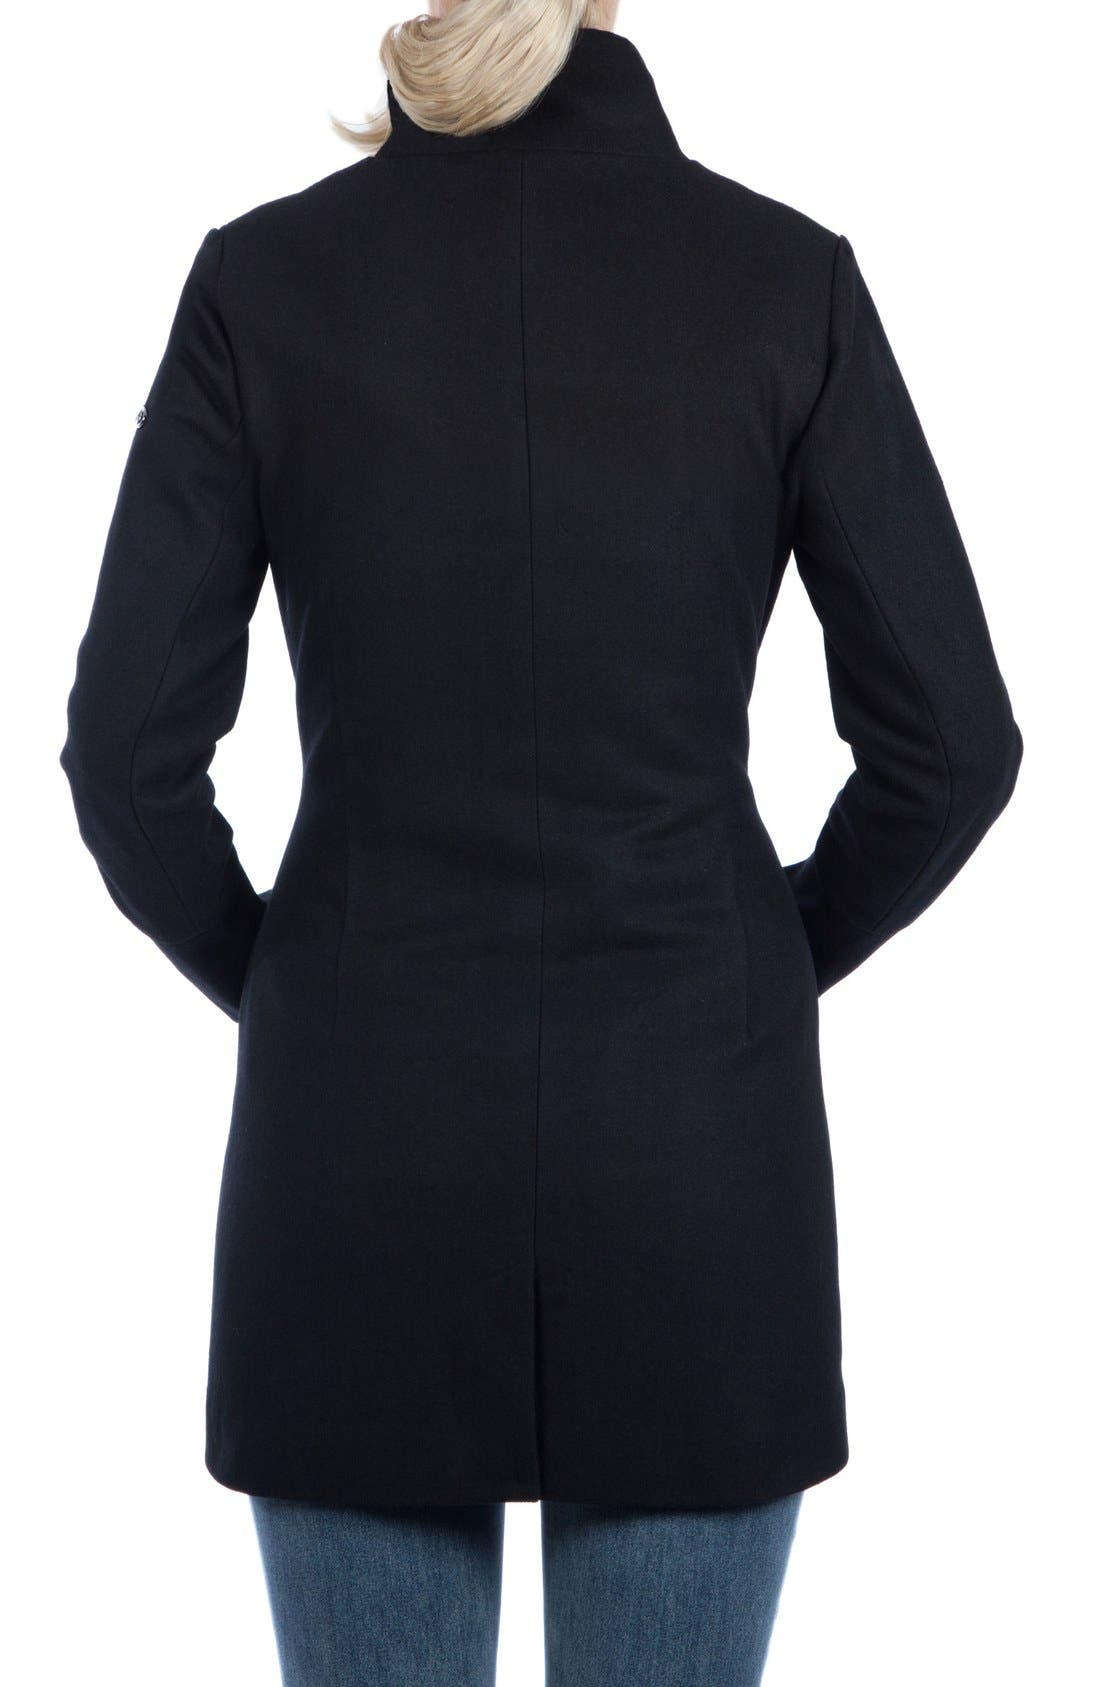 MODERN ETERNITY, Convertible 3-in-1 Maternity/Nursing Coat, Alternate thumbnail 7, color, BLACK